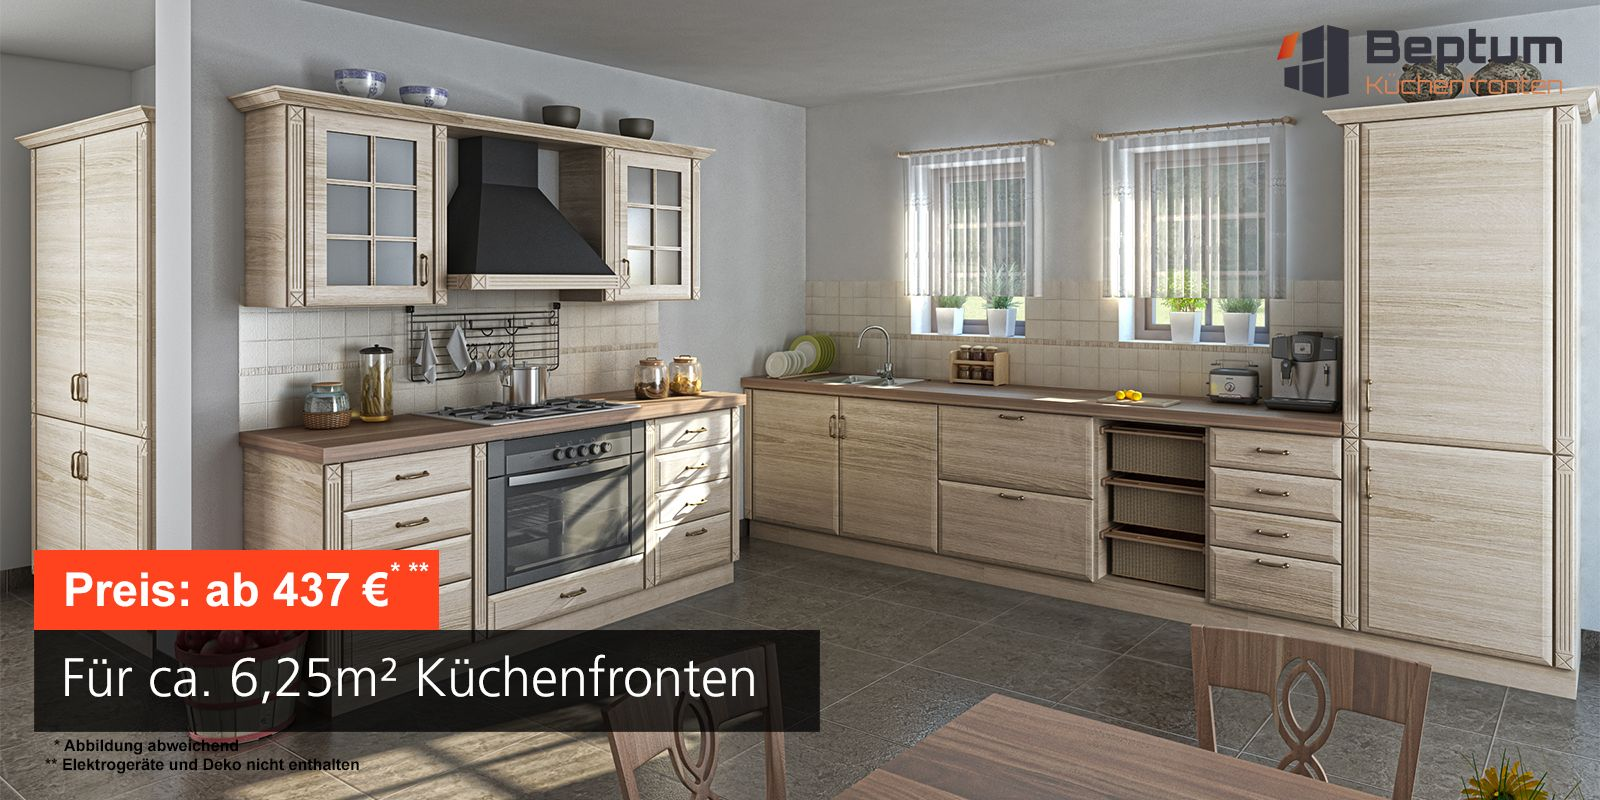 best k chenfronten neu beschichten photos. Black Bedroom Furniture Sets. Home Design Ideas